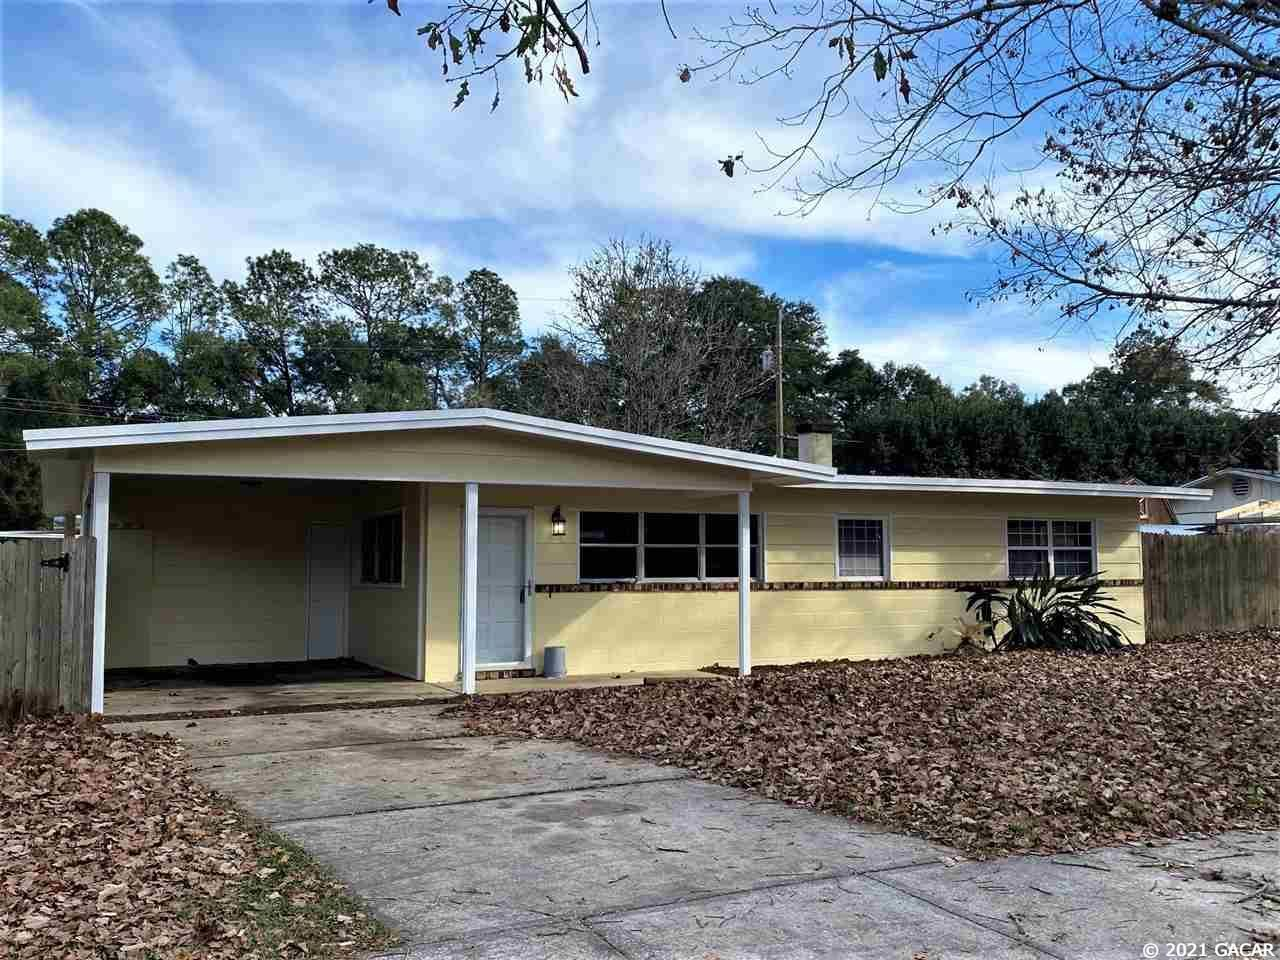 16901 NW 173 Terrace, Alachua, FL 32615 - #: 440615